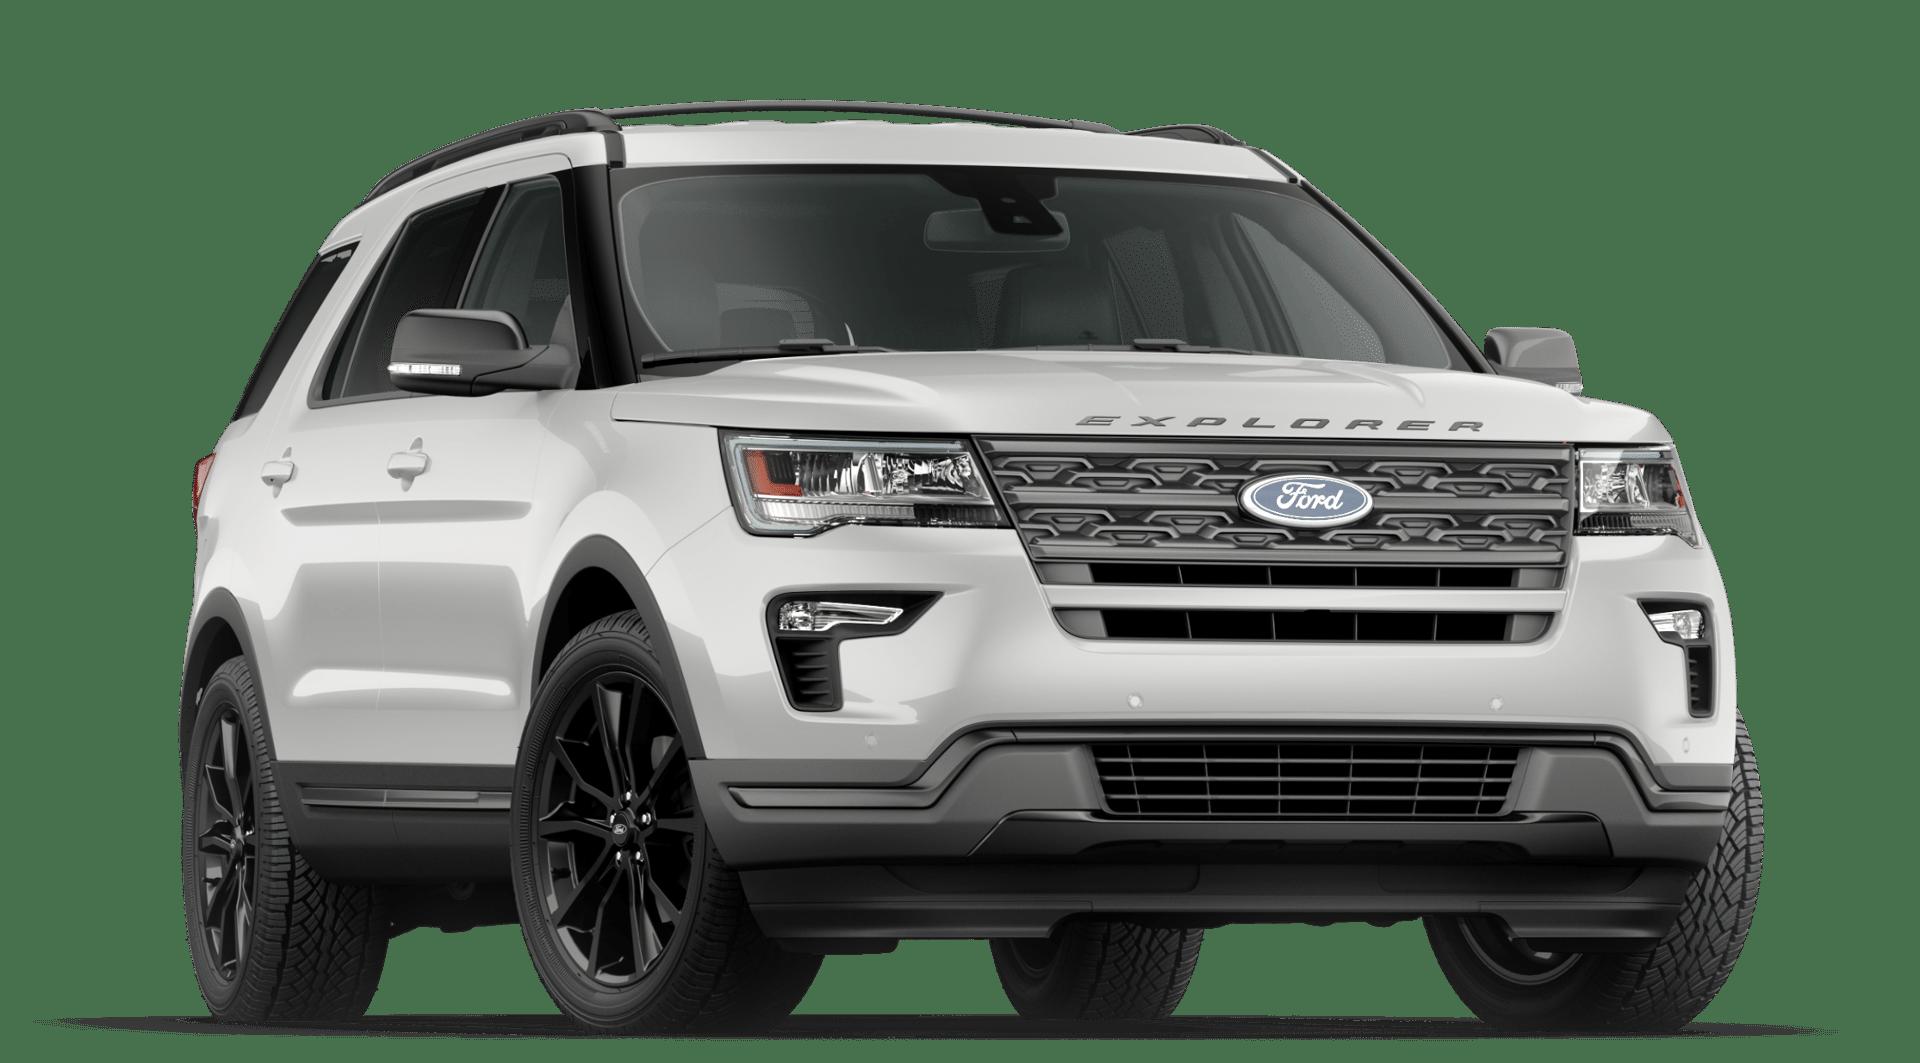 Ford Edge 2019 Https Www Suvdrive Com Ford Edge Ford Edge